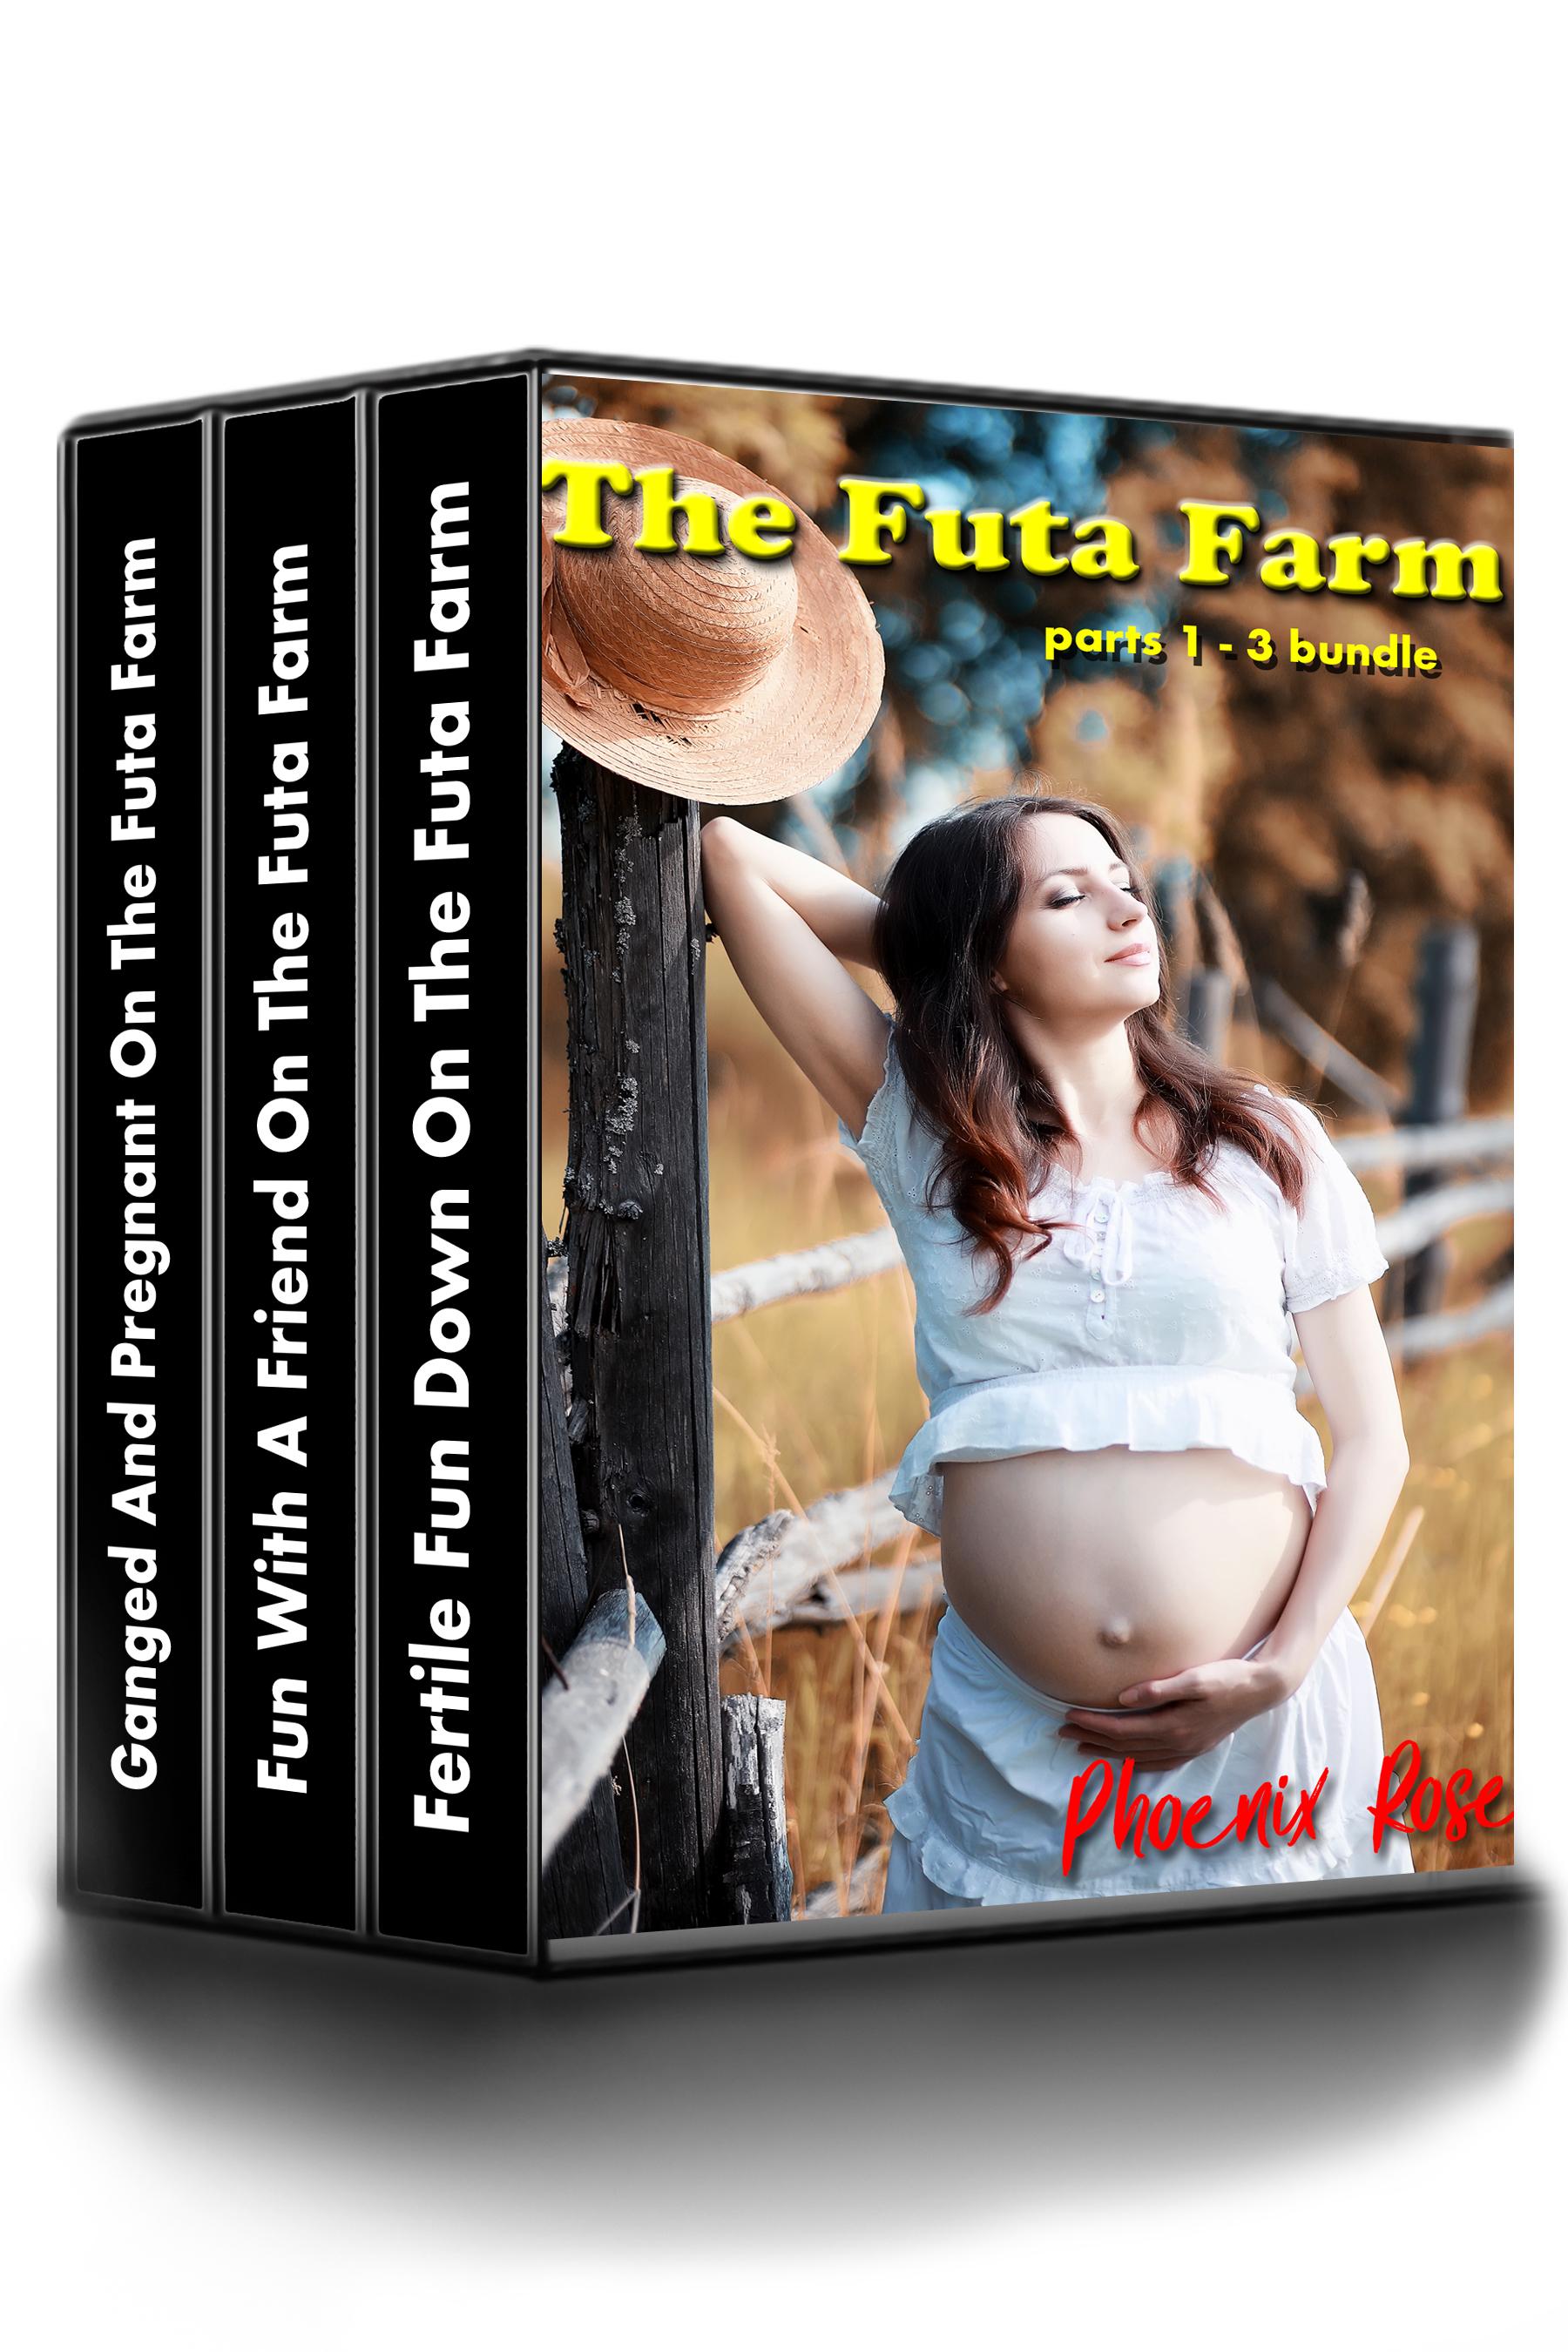 The Futa Farm bundle